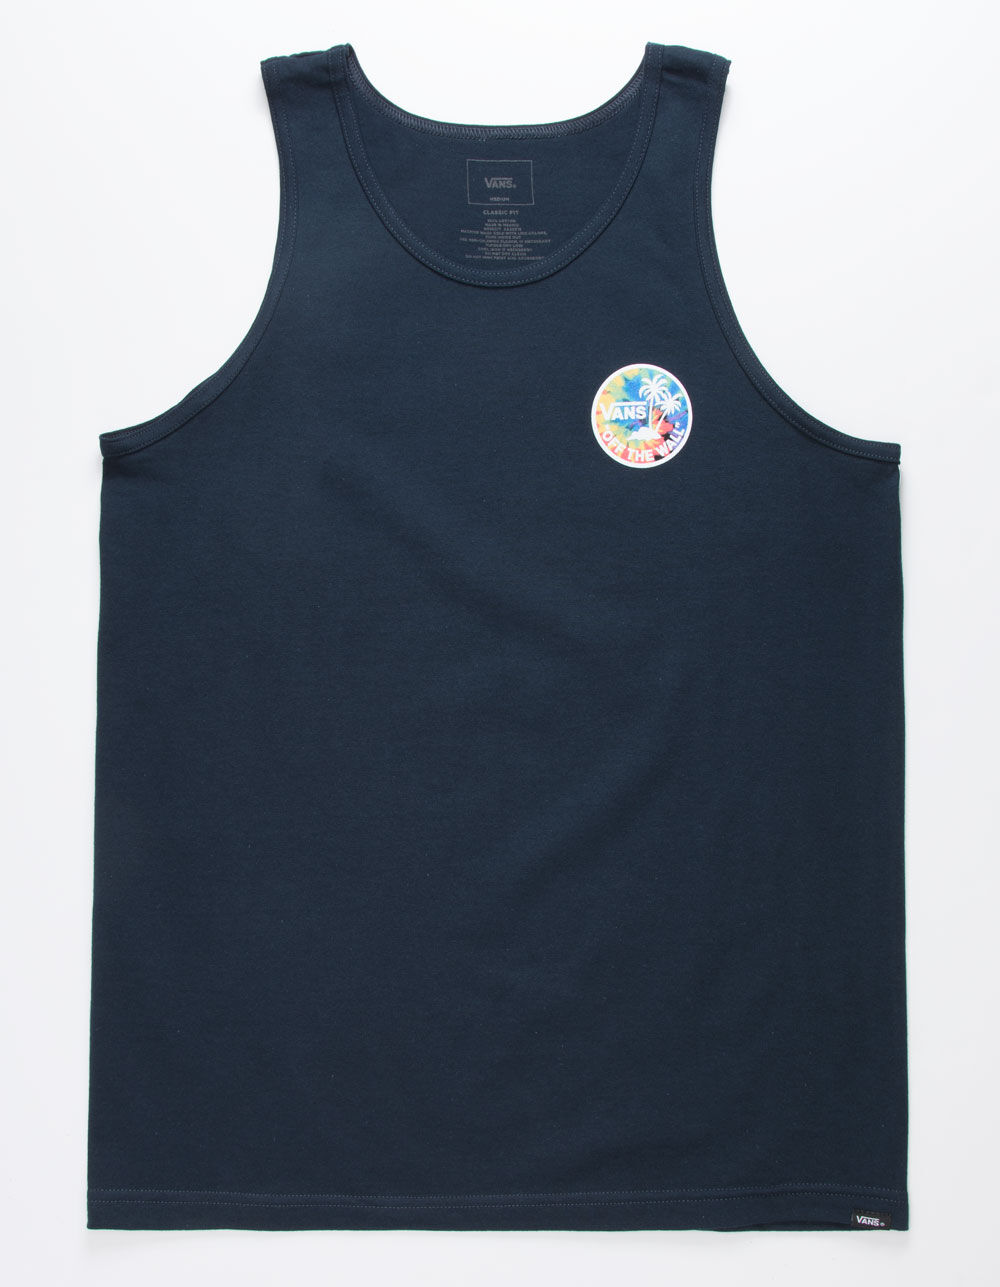 VANS Dual Palm Fill Tie Dye Tank Top